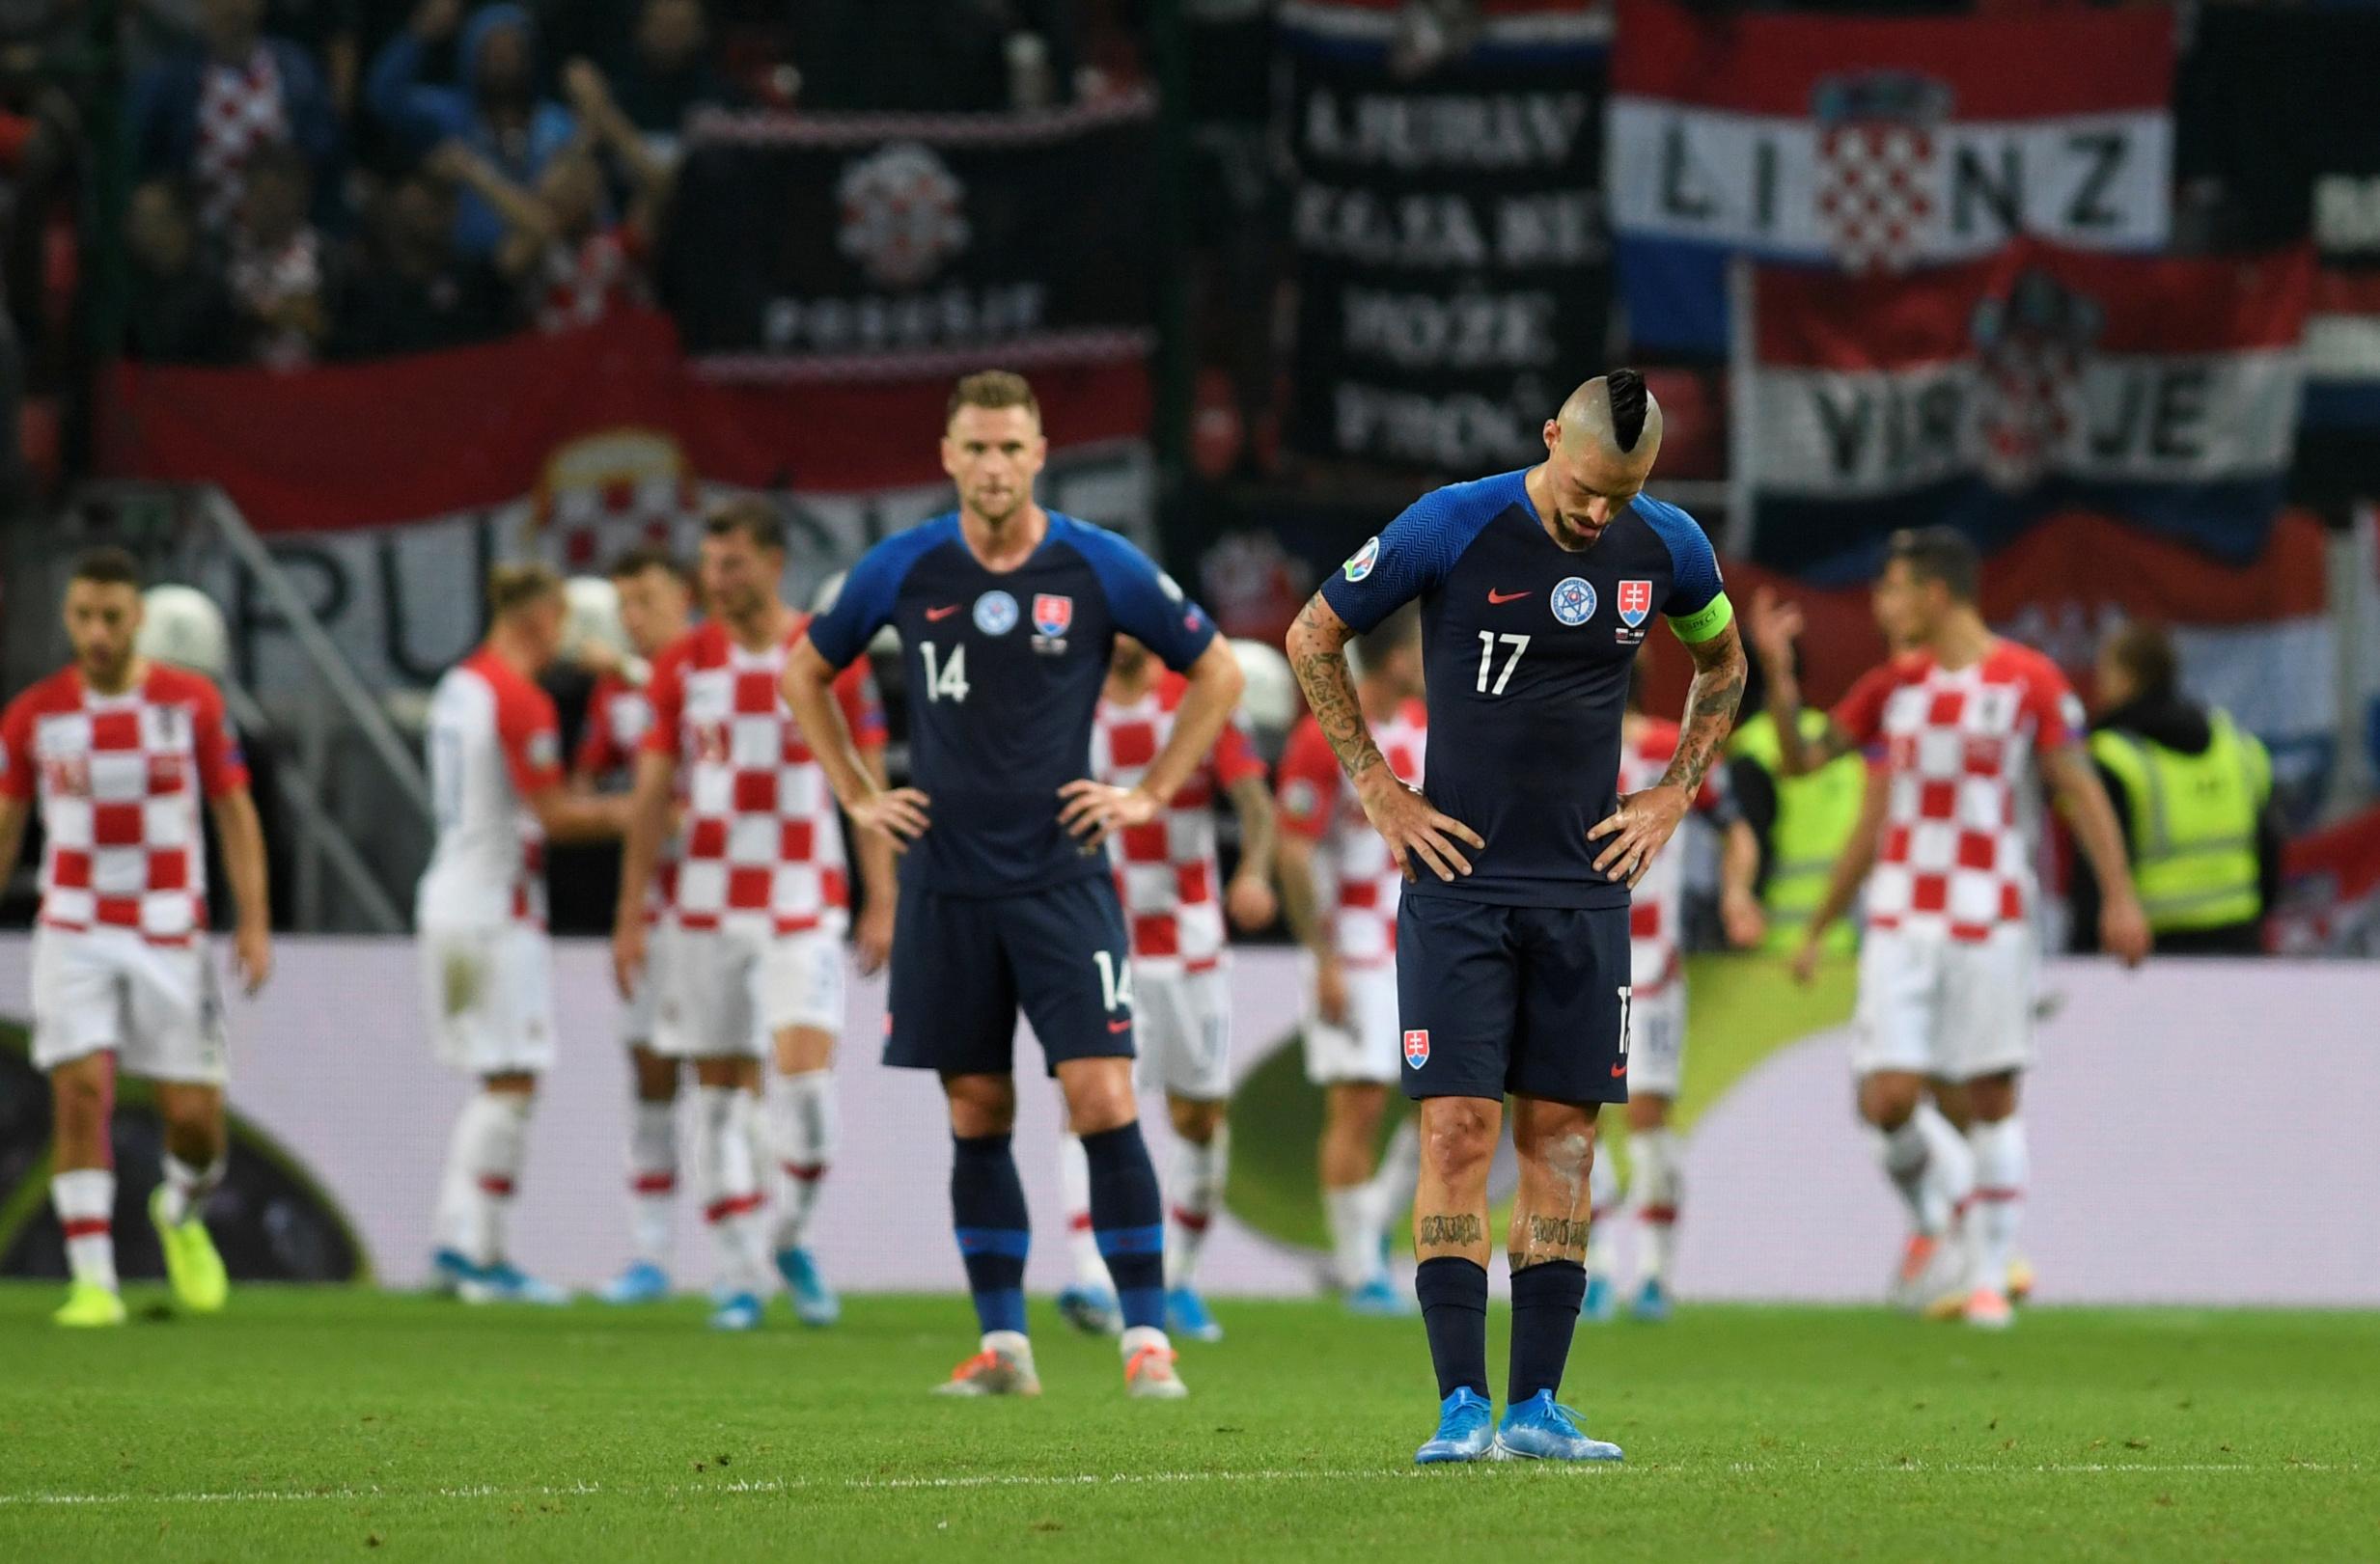 Soccer Football - Euro 2020 Qualifier - Group E - Slovakia v Croatia - City Arena, Trnava, Slovakia - September 6, 2019  Slovakia's Marek Hamsik looks dejected after Croatia's third goal      REUTERS/Radovan Stoklasa - RC1C0E0EB2E0